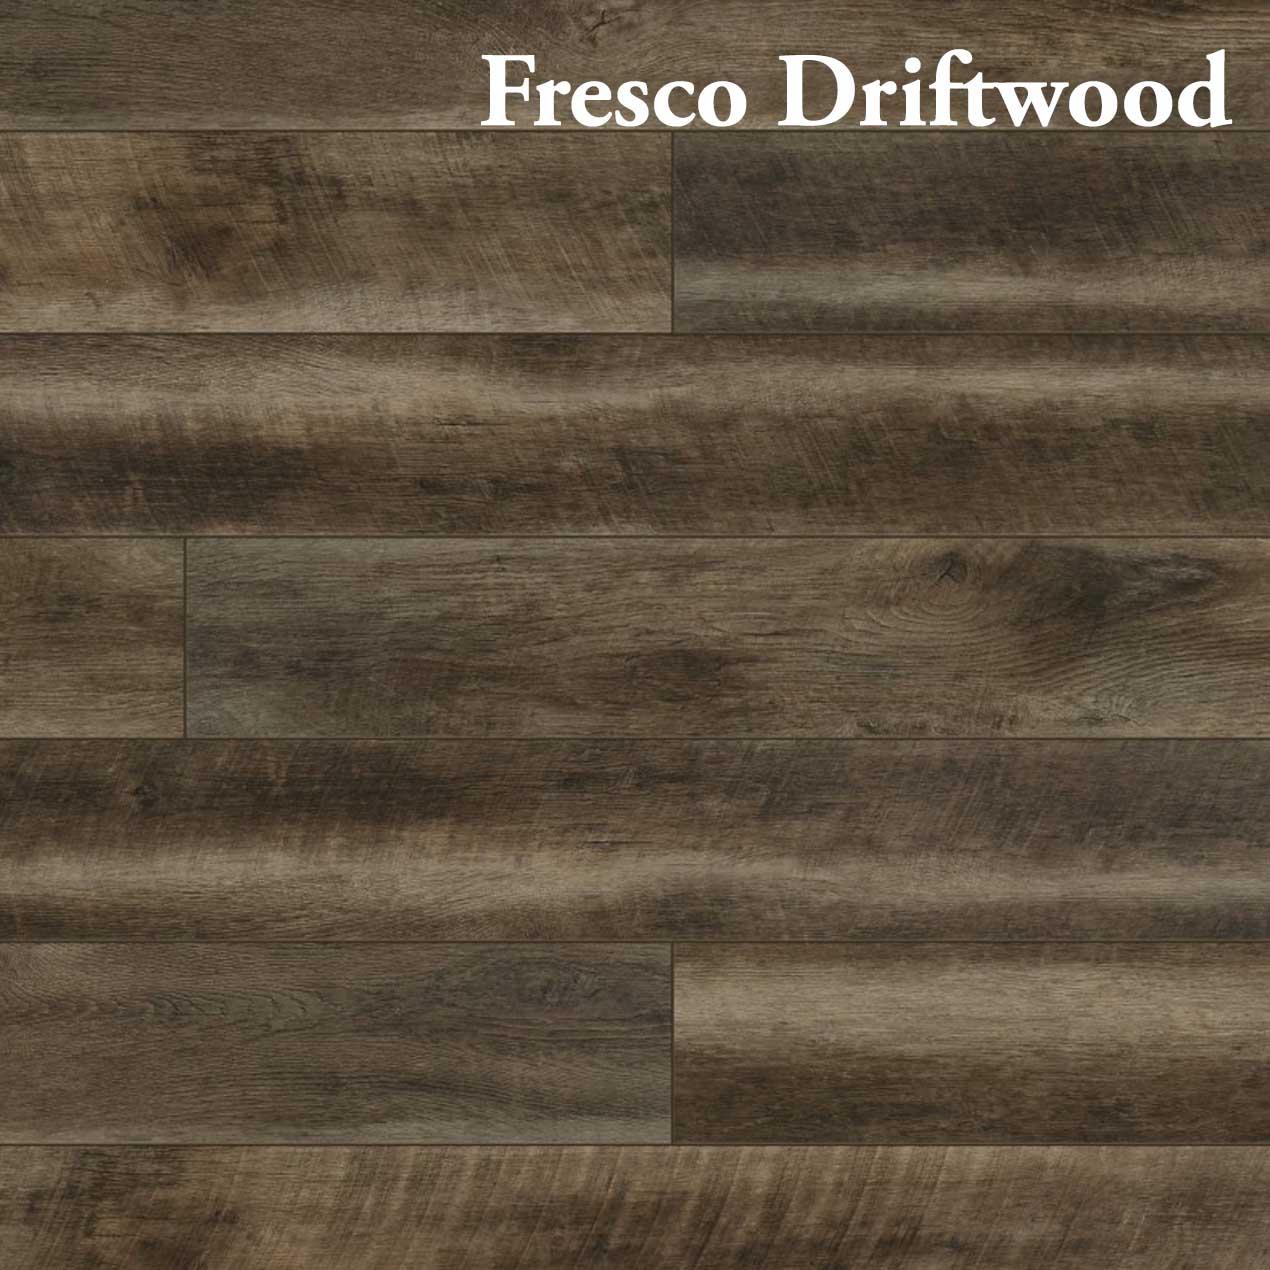 Absorbing Add To Cart Coretec Hd Luxury Vinyl Plank Floating Capitol City Lumber Coretec Hd Smoked Rustic Pine Hd Rustic Pine Coretec houzz 01 Coretec Plus Hd